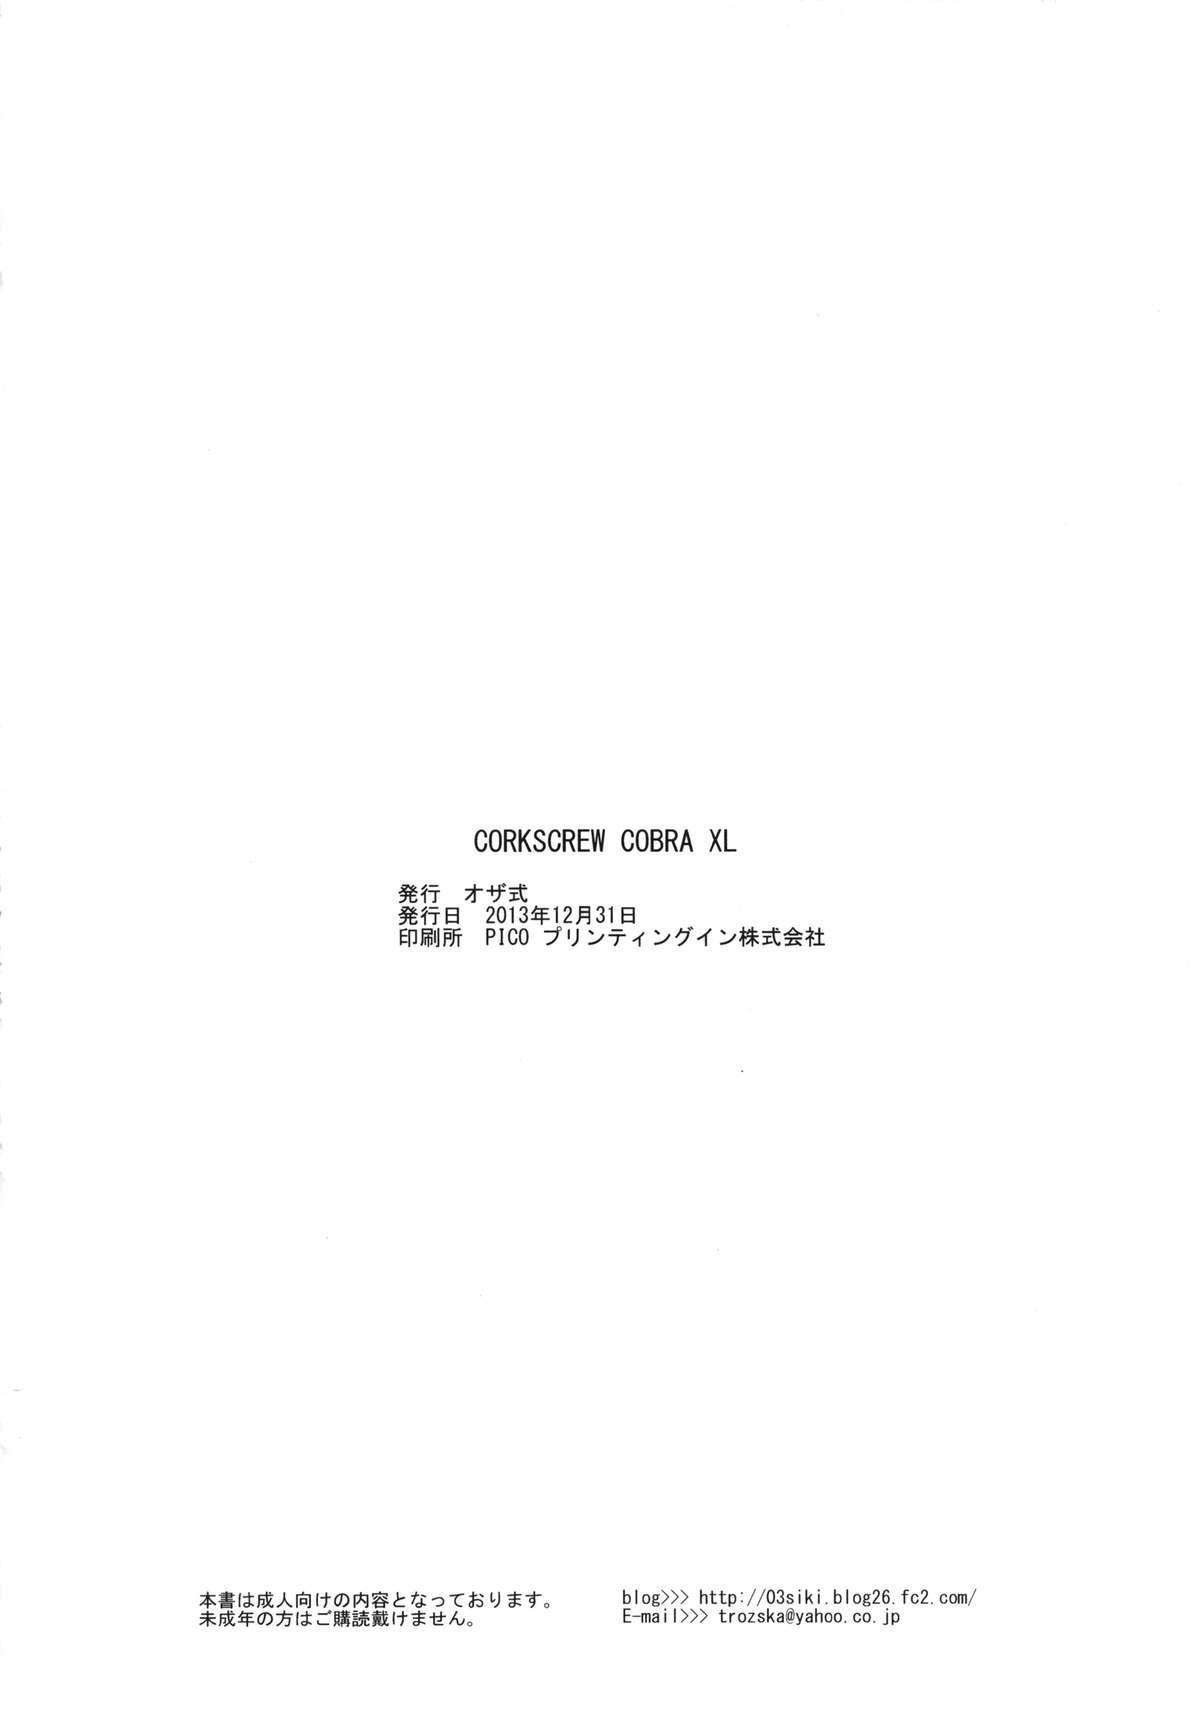 CORKSCREW COBRA XL 21